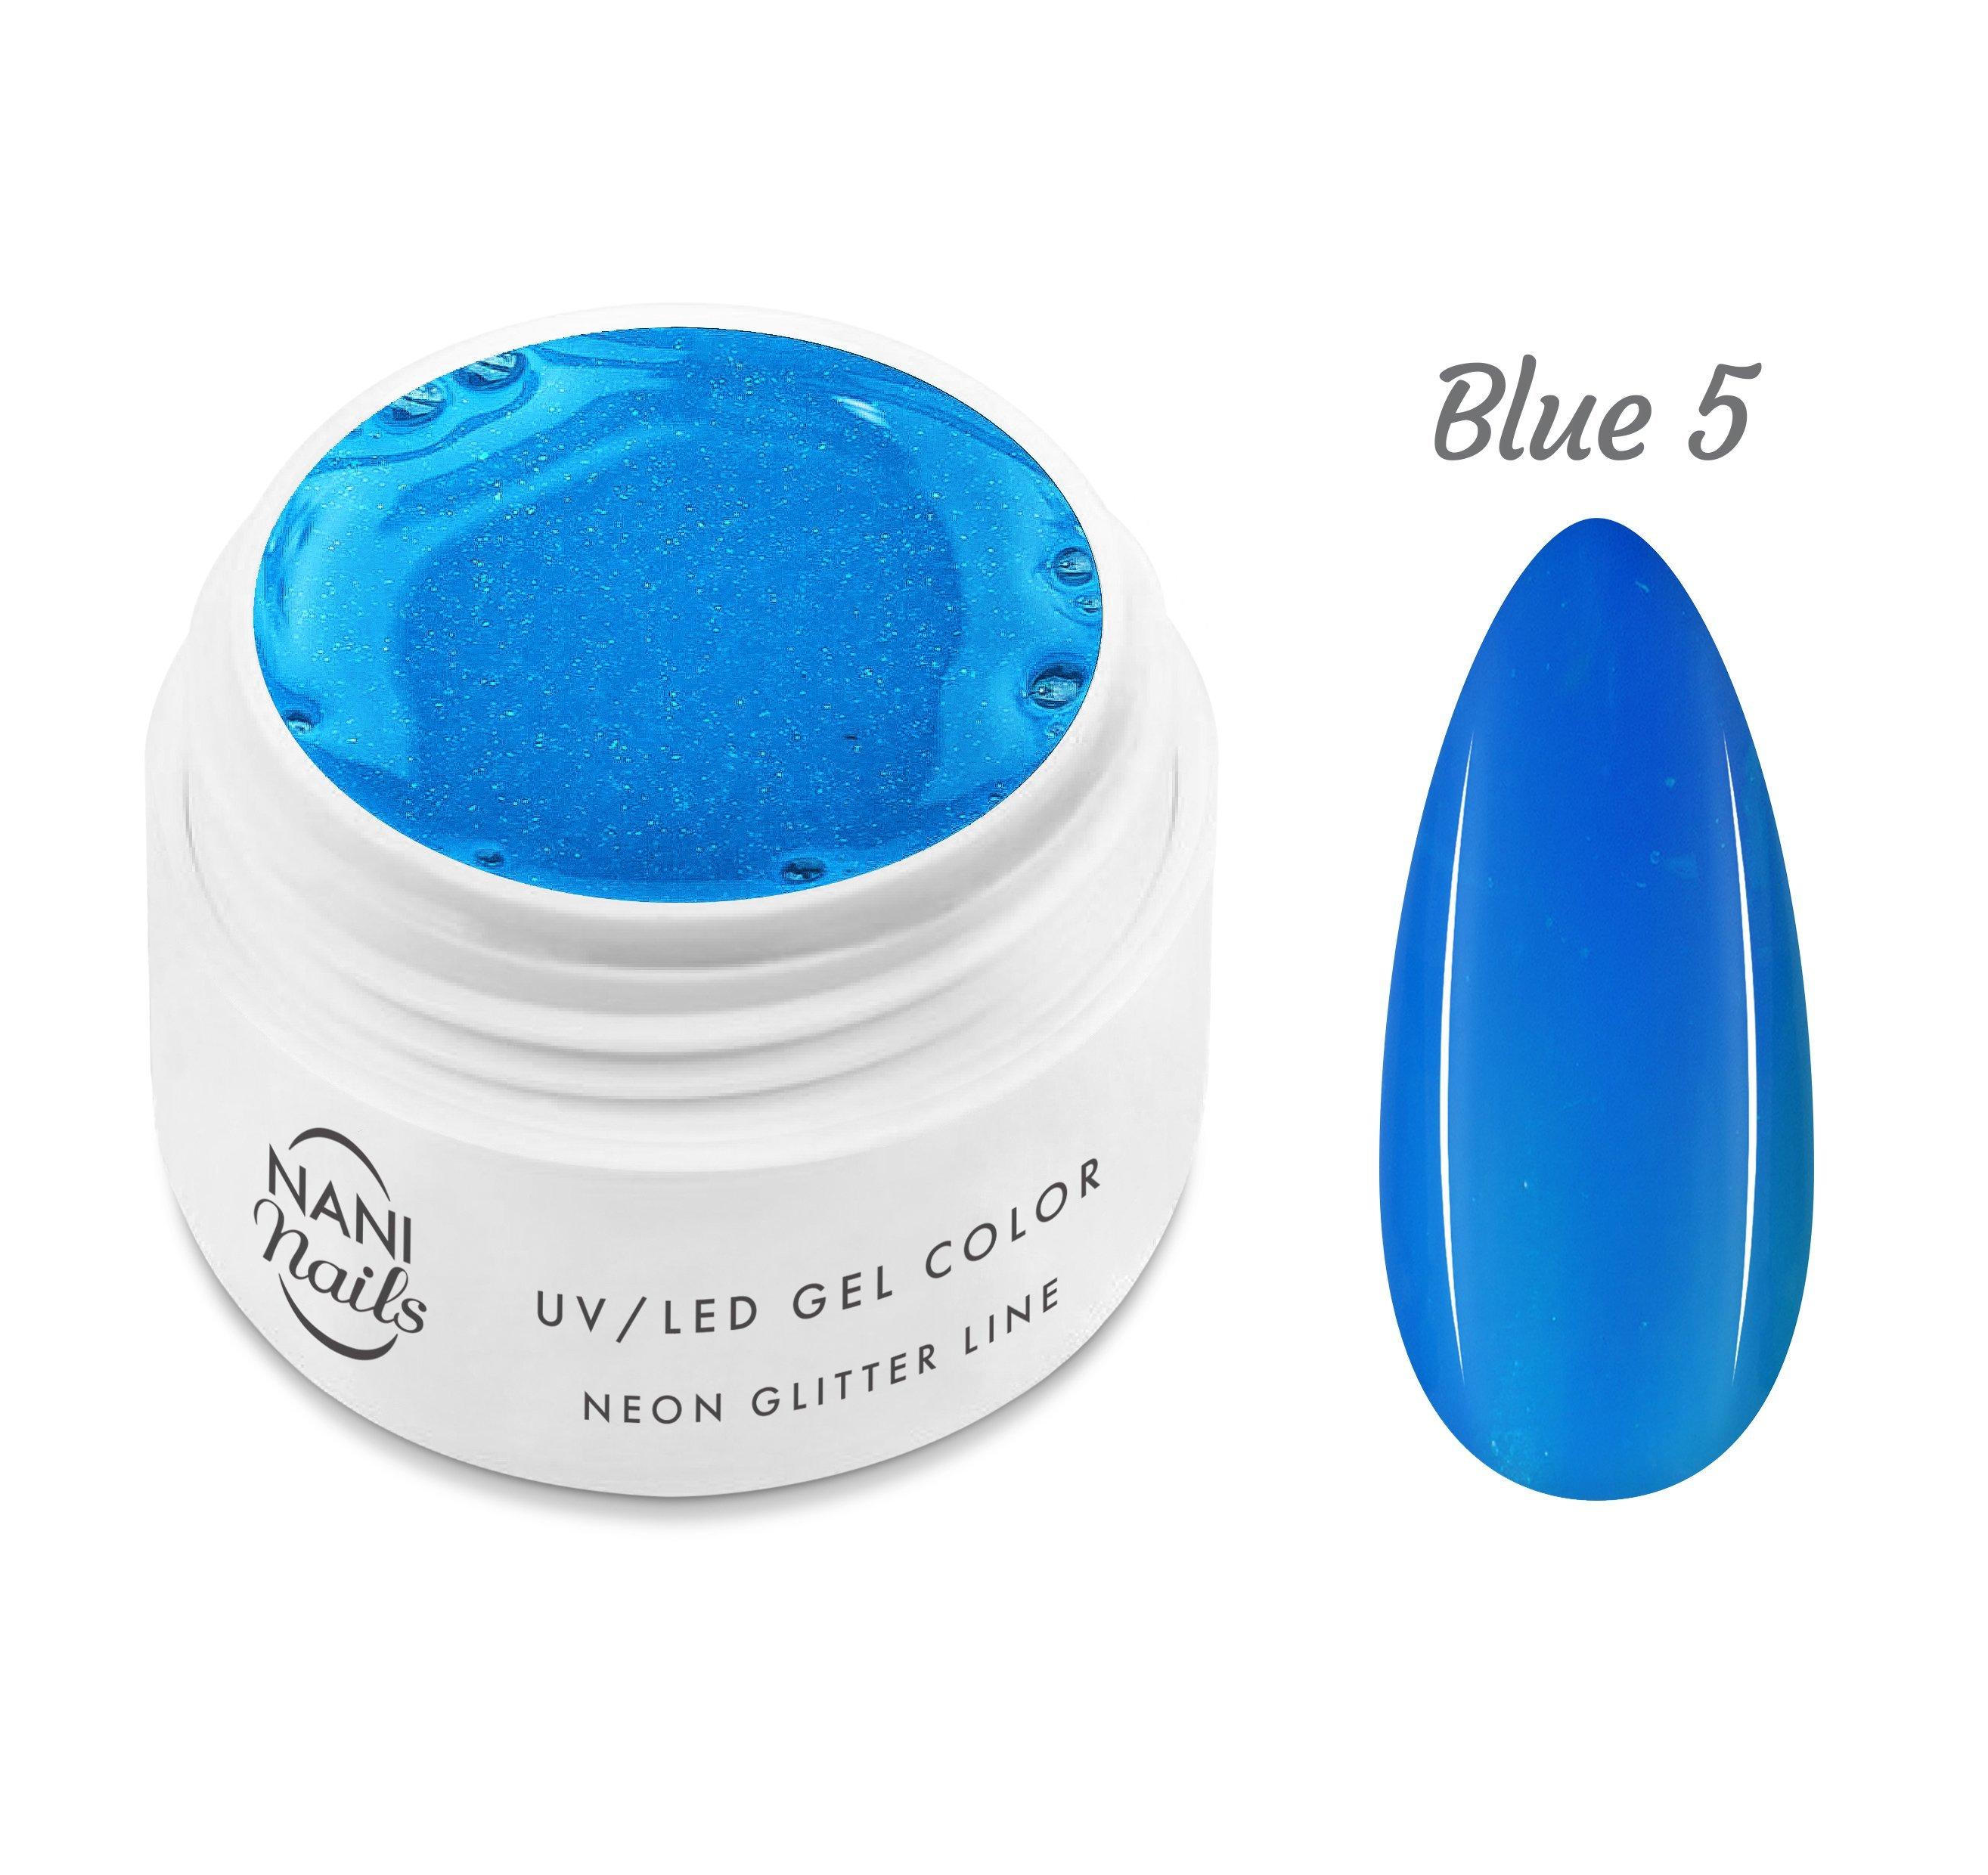 NANI UV gél Neon Glitter Line 5 ml - Blue